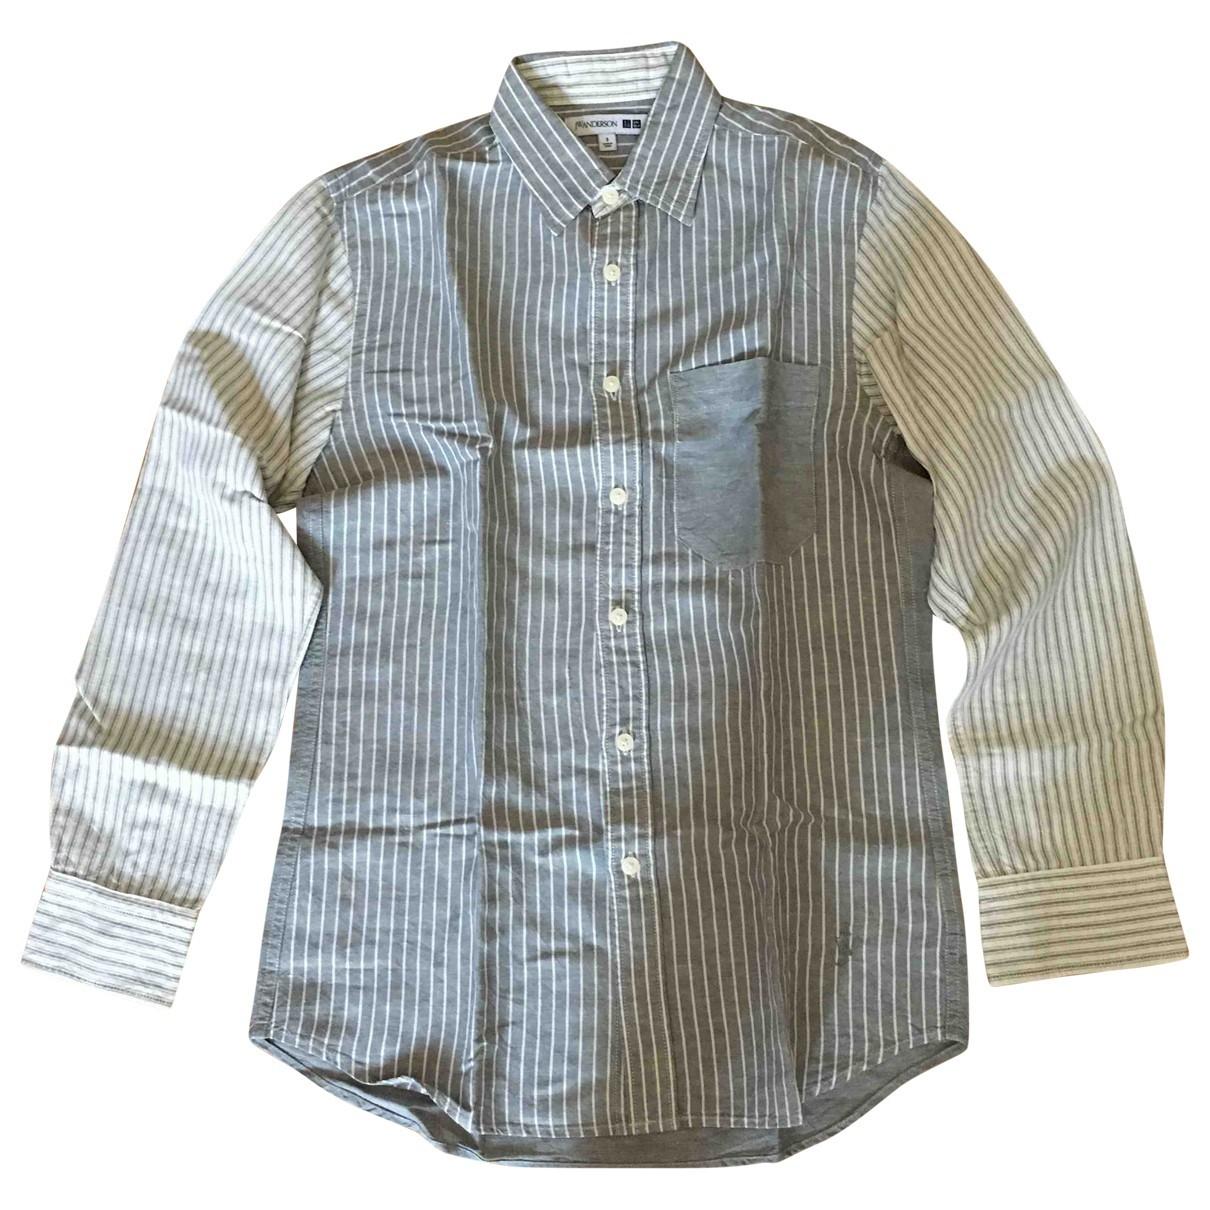 Uniqlo \N Grey Linen Shirts for Men S International